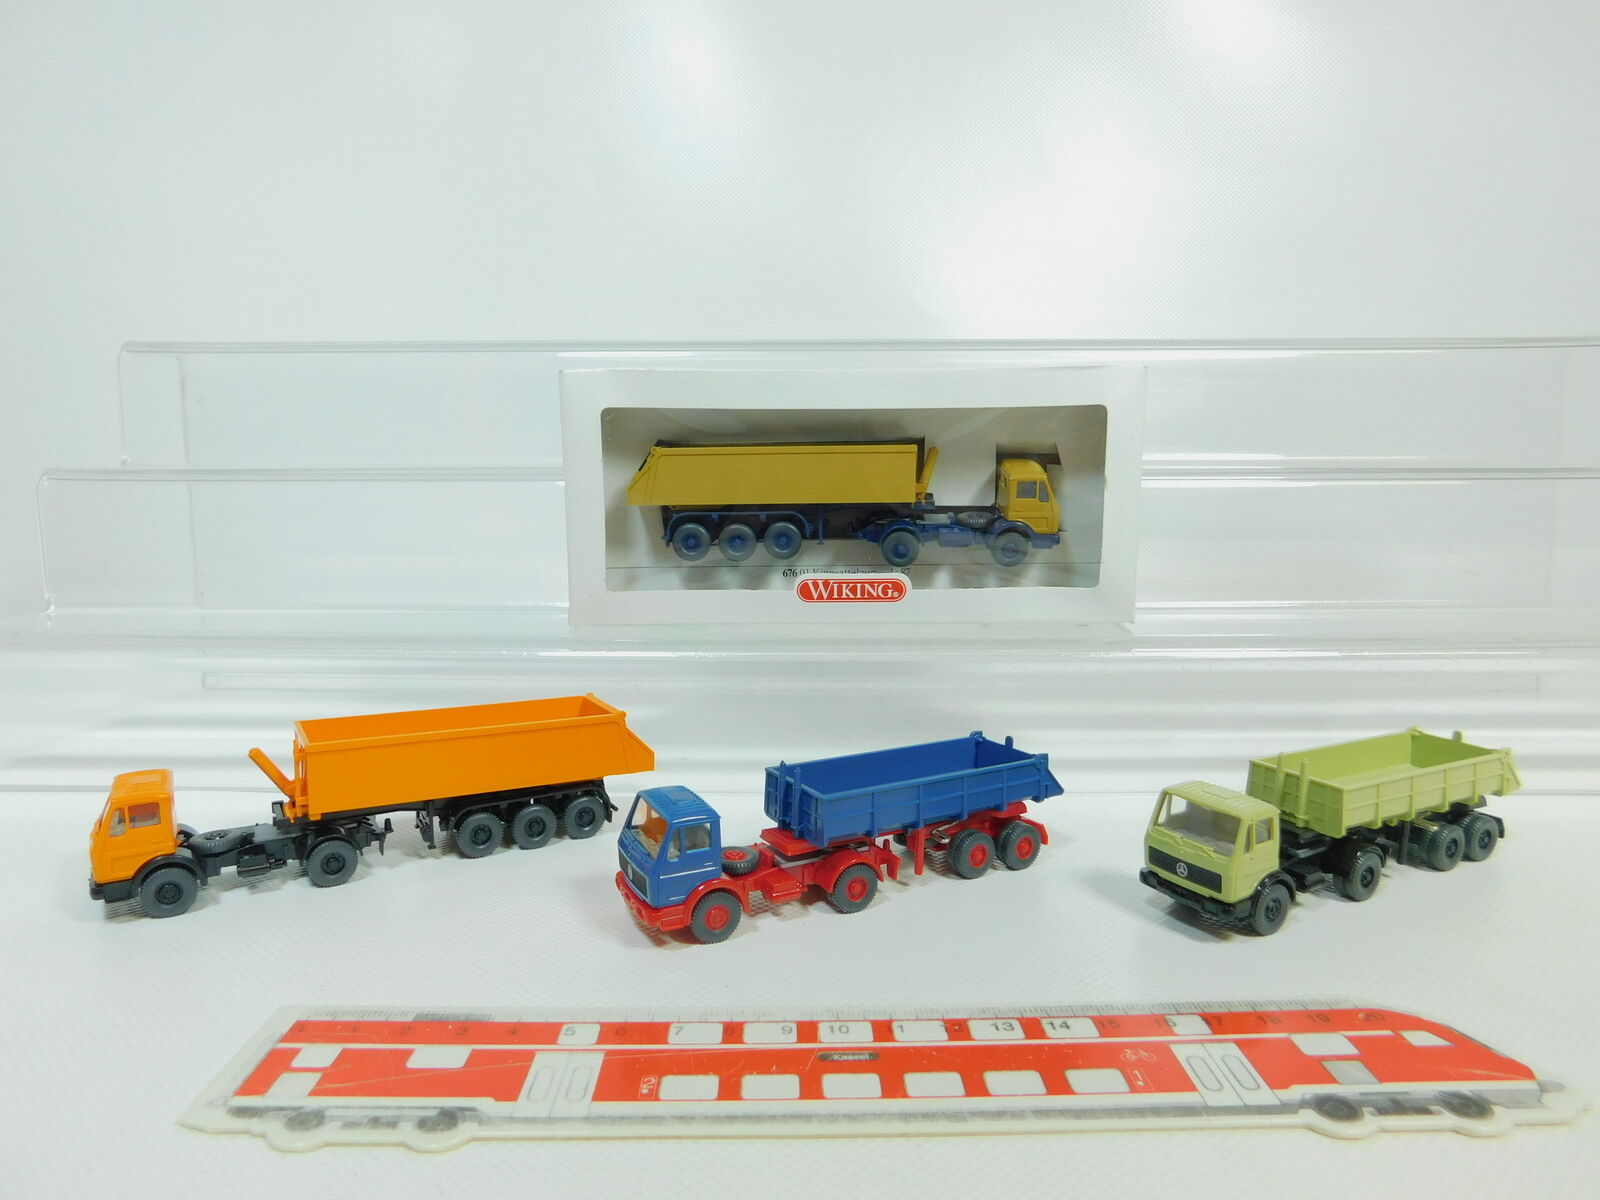 BO497-0,5 x Wiking H0   1 87 Lorry Lorry Lorry Mercedes-Benz   MB  676 01 etc. ,Mint + 1x 04313f